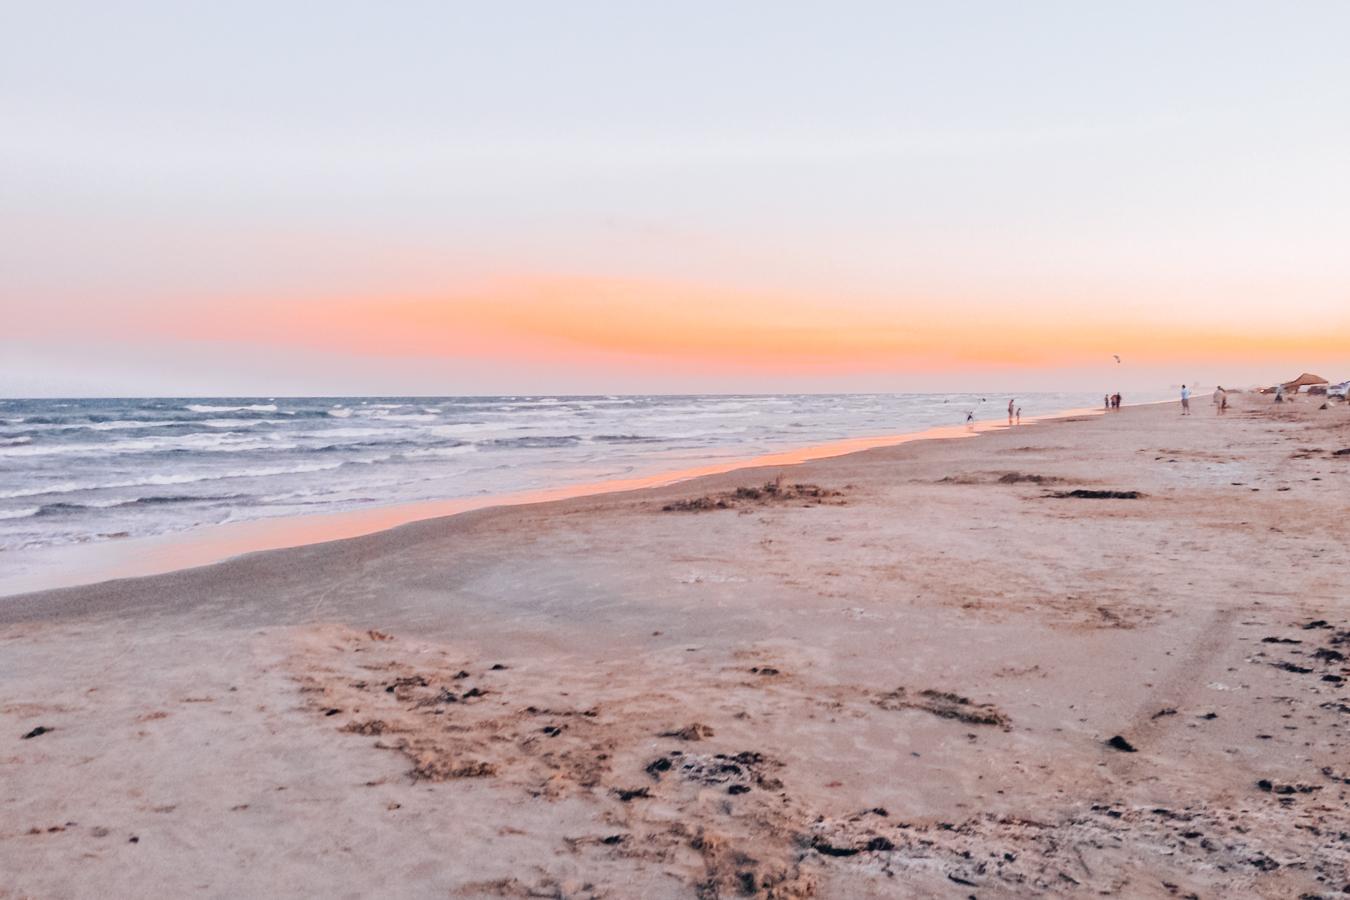 Sunset at a beach in Port Aransas